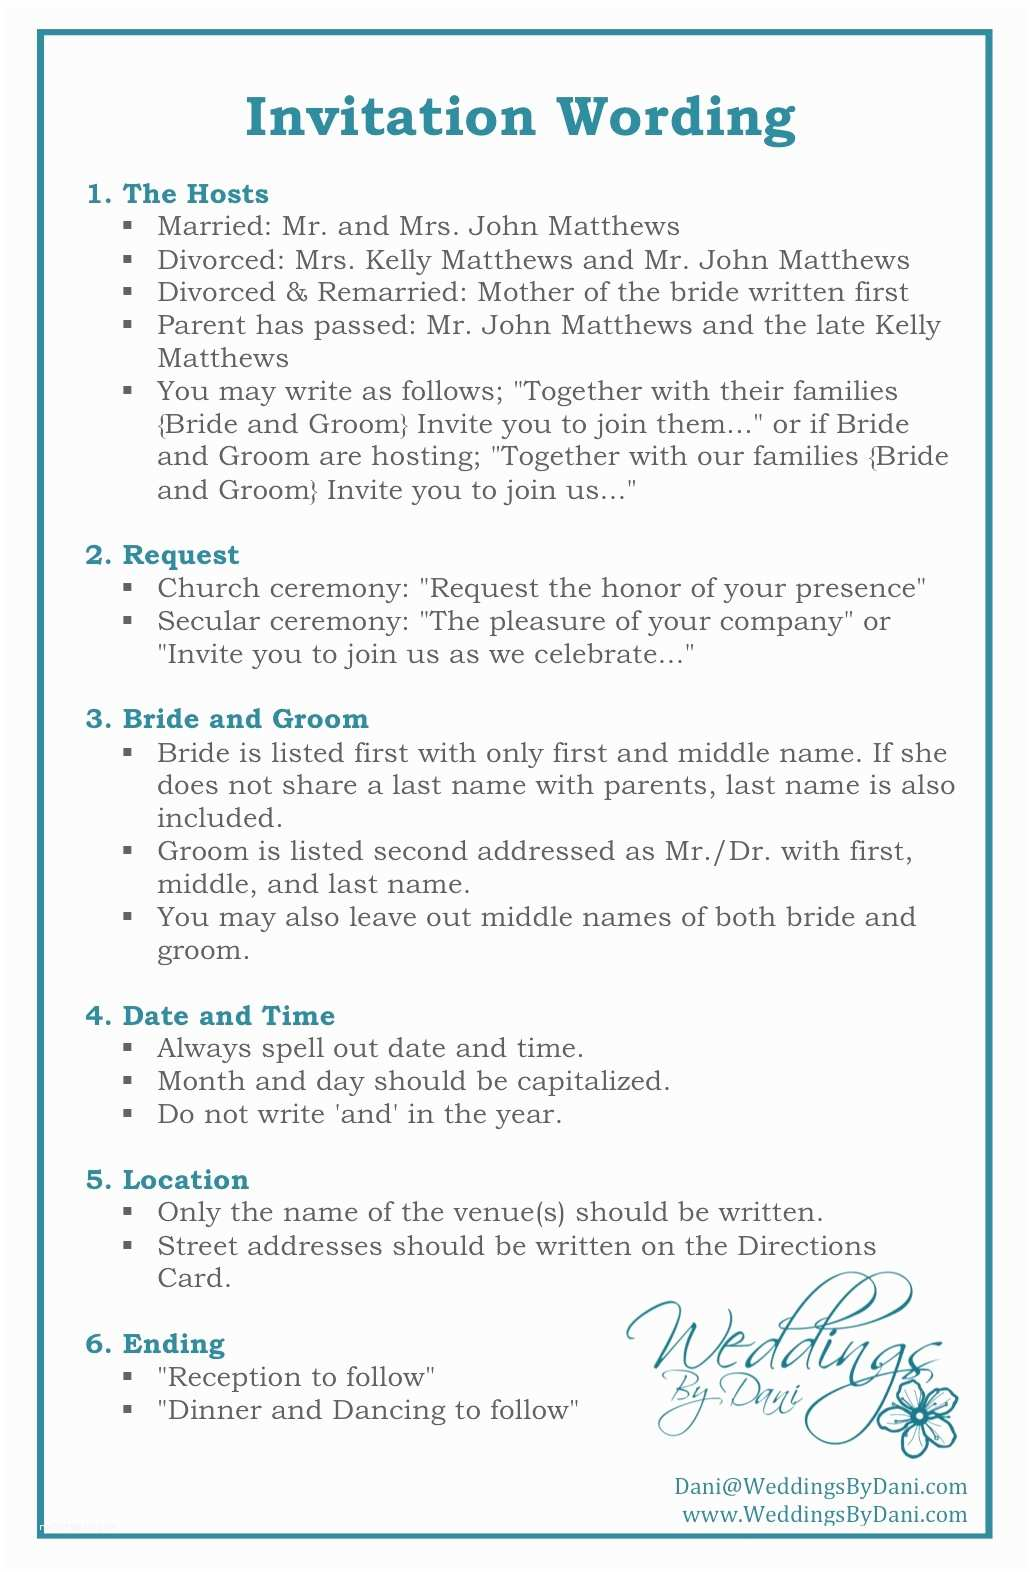 Wedding Invitation Verbiage Wedding Invitation Email Wording